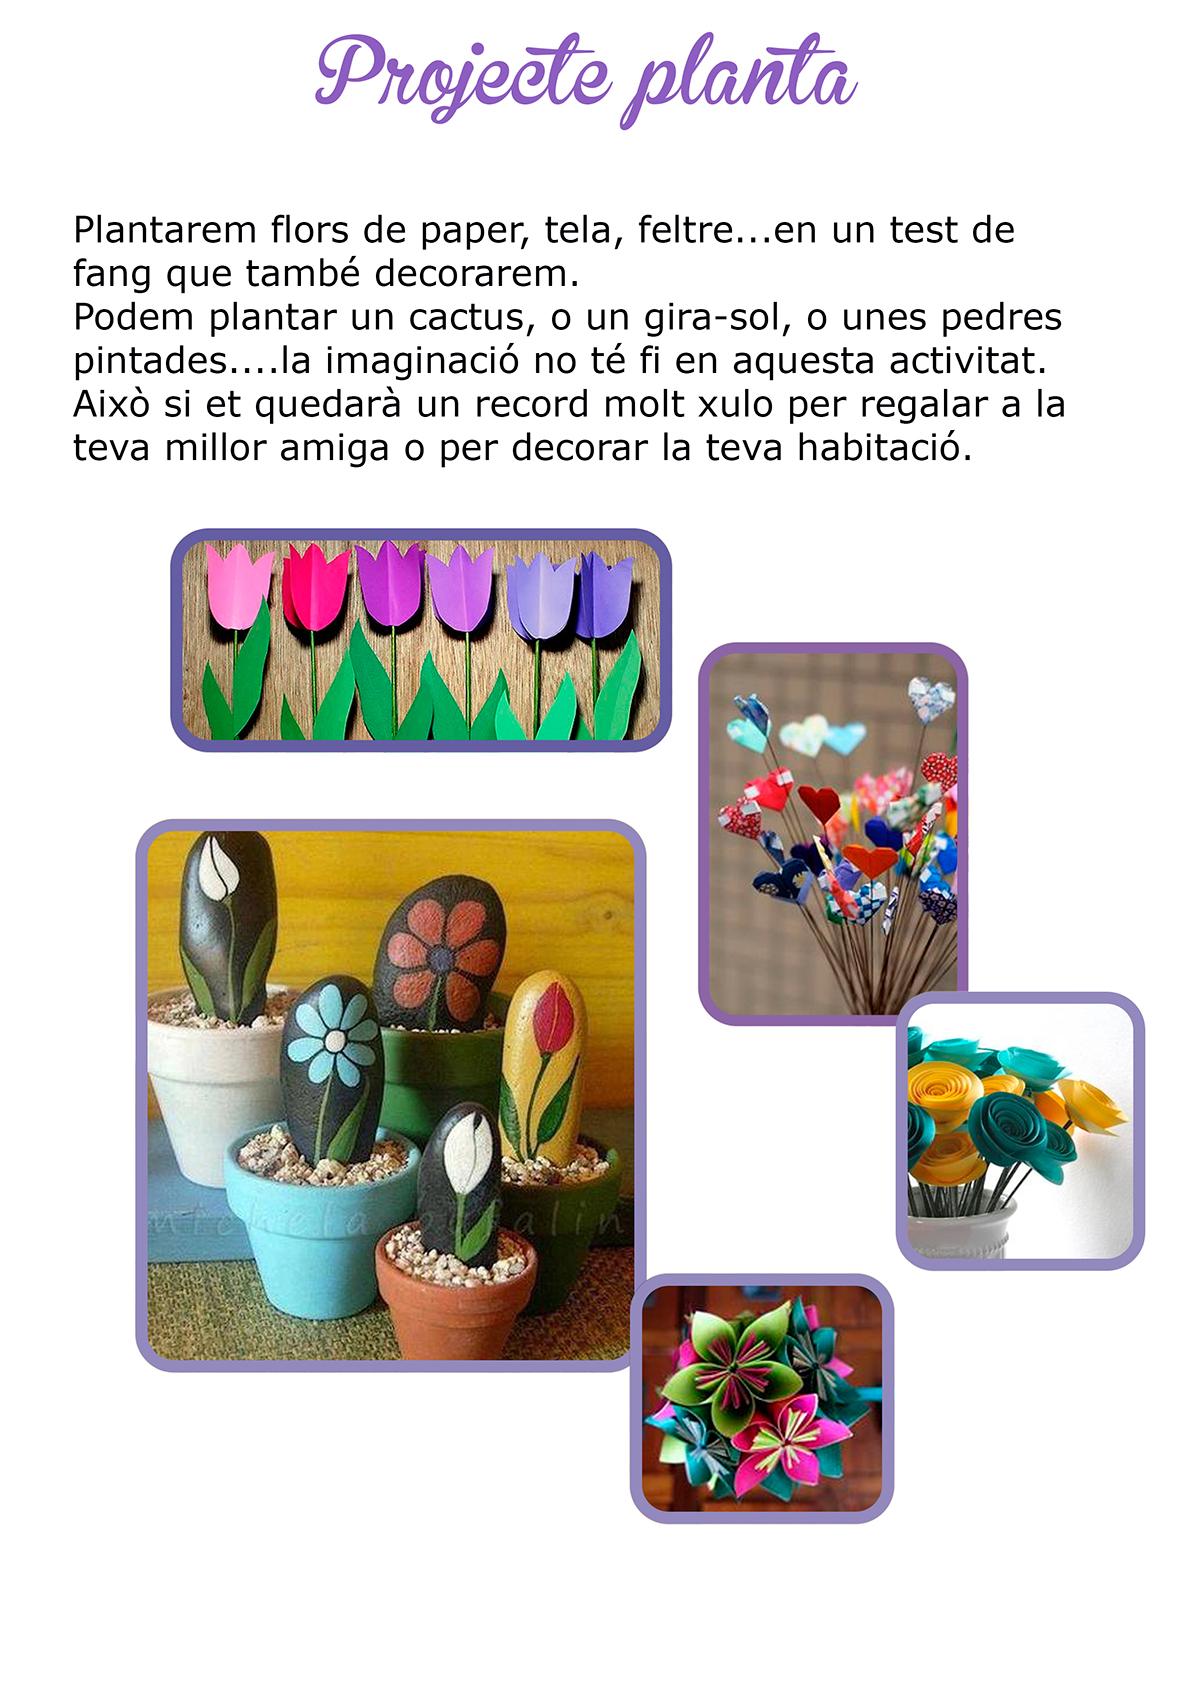 projecte planta